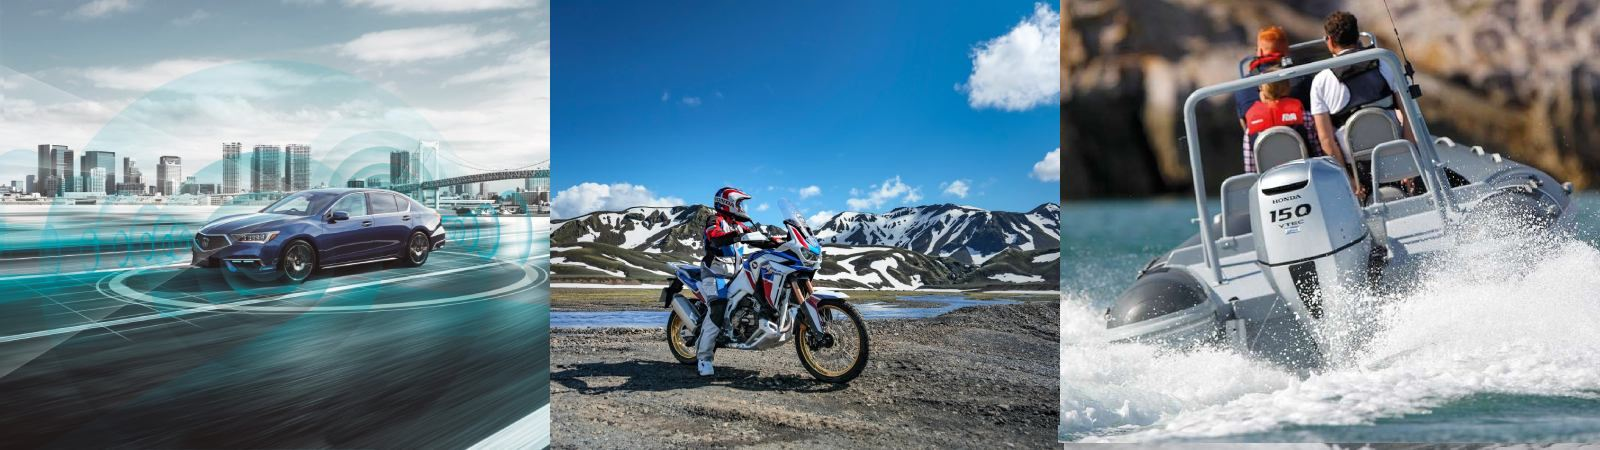 HONDA_NEWS_CARS_MOTORCYCLES_SCOOTERS_MARINE